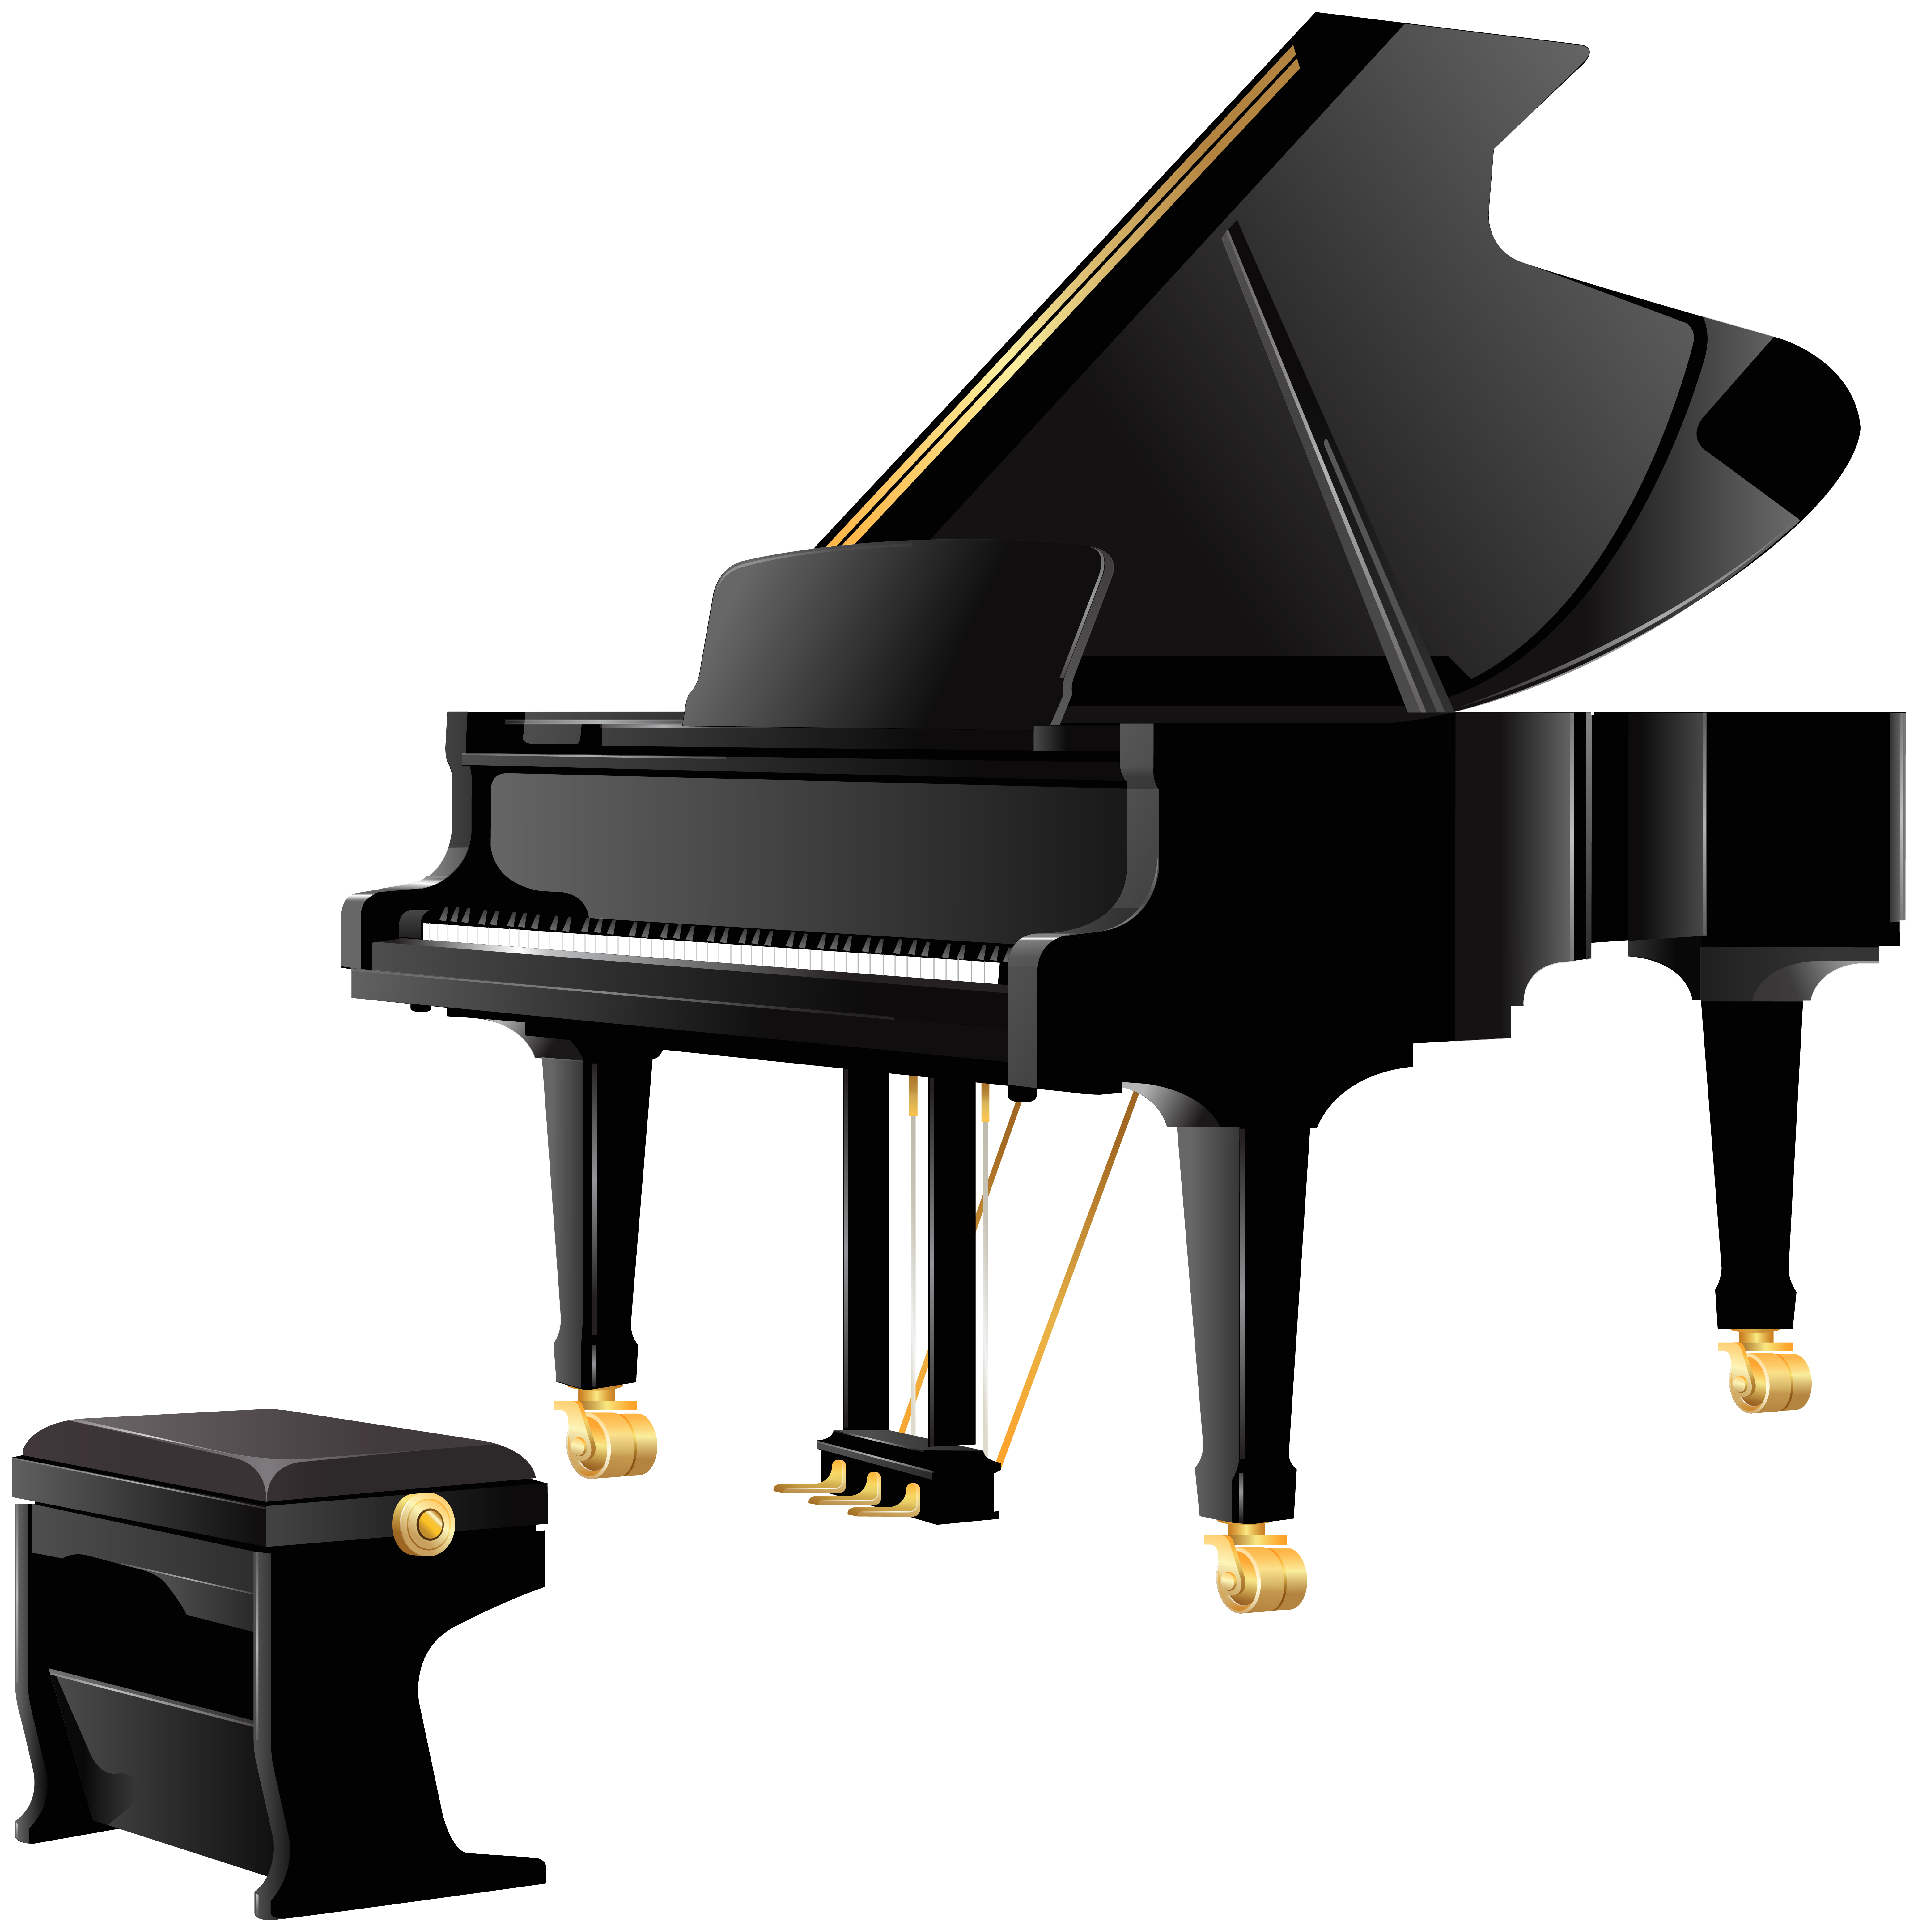 Christmas piano clipart jpg transparent Royal Grand Piano PNG Clipart - Best WEB Clipart jpg transparent